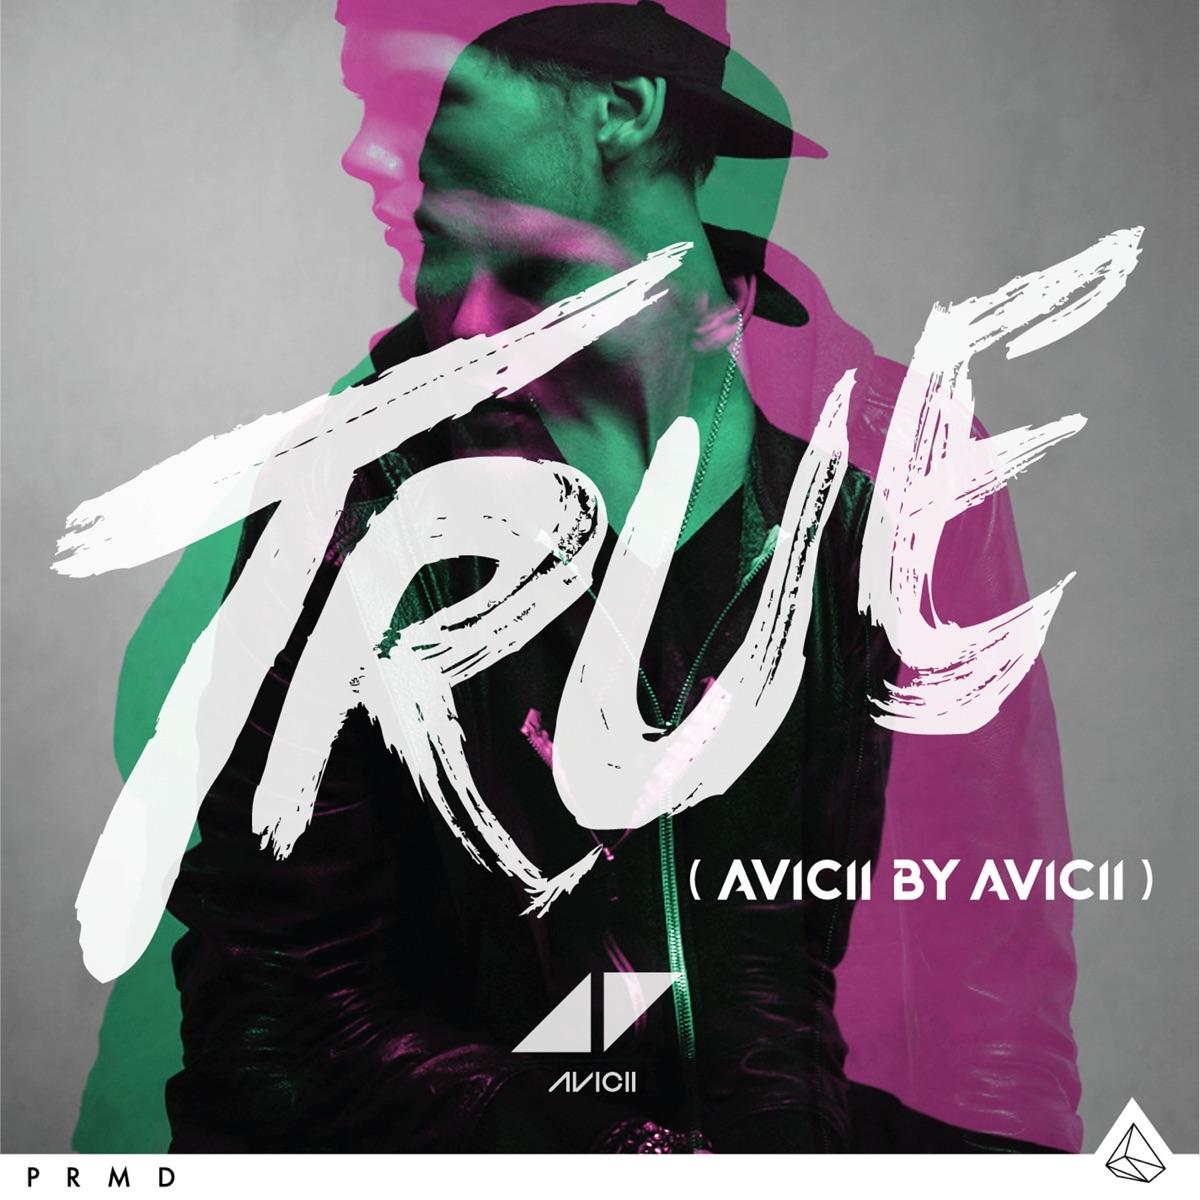 True Avicii By Avicii Avicii CD cover